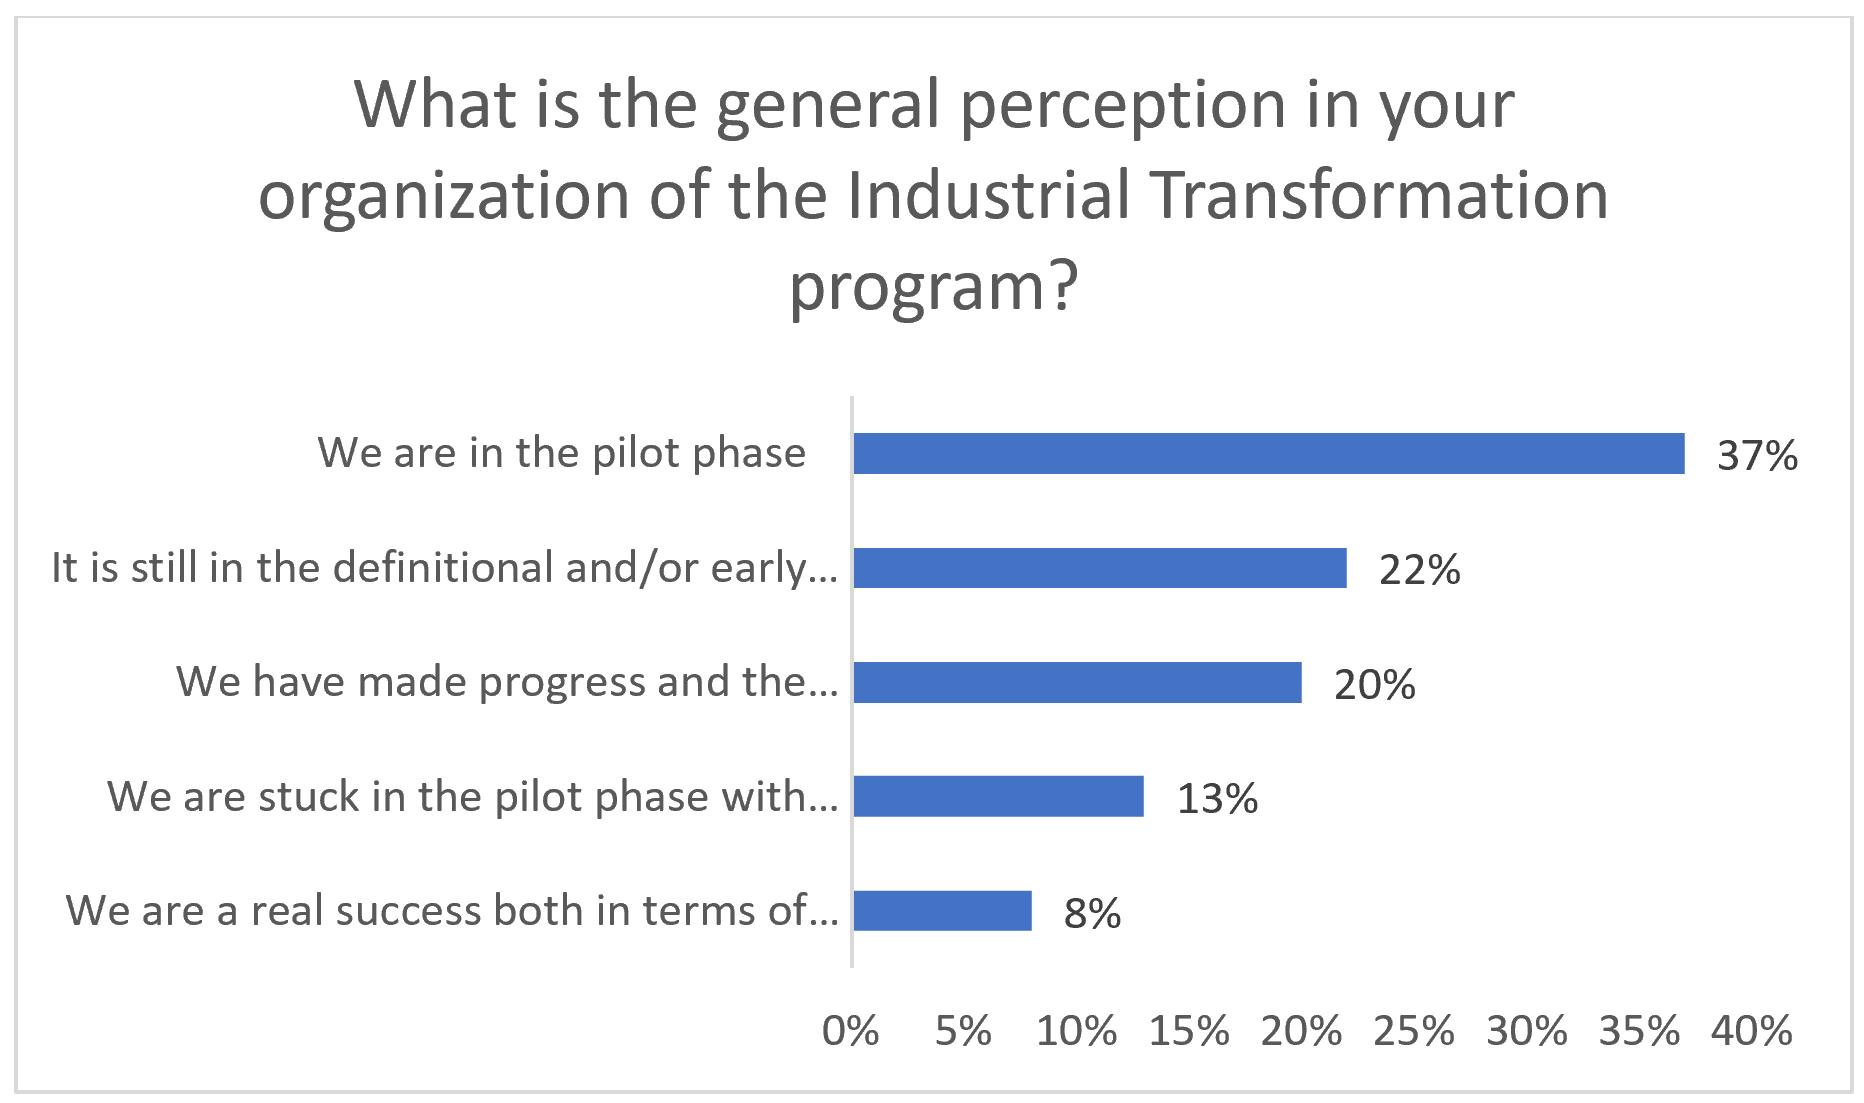 General Perception of Industrial Transformation Program